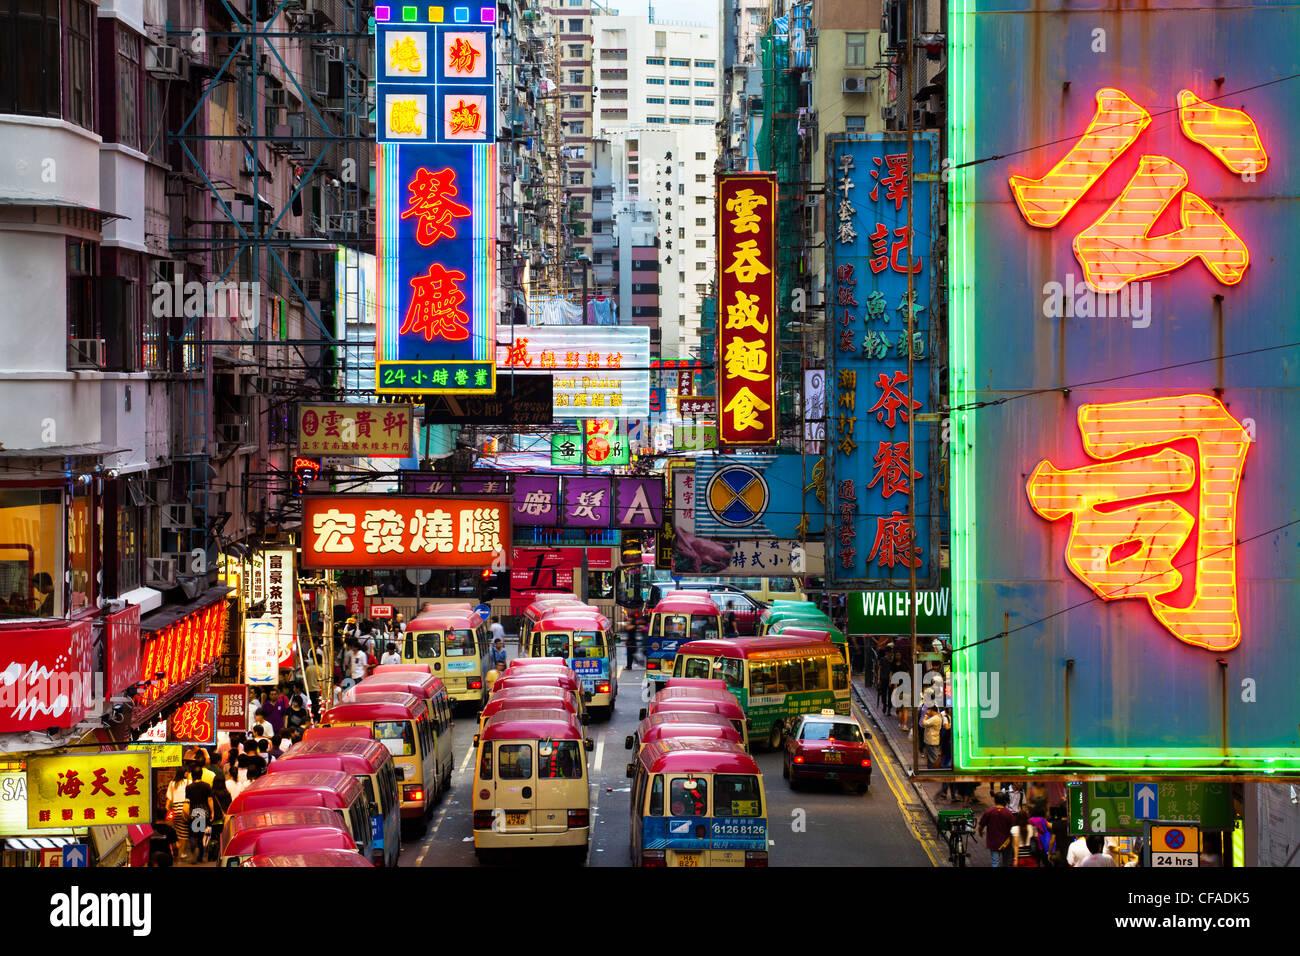 Scena di strada, Mini bus station e luci al neon di Mong Kok, Kowloon, Hong Kong, Cina Immagini Stock